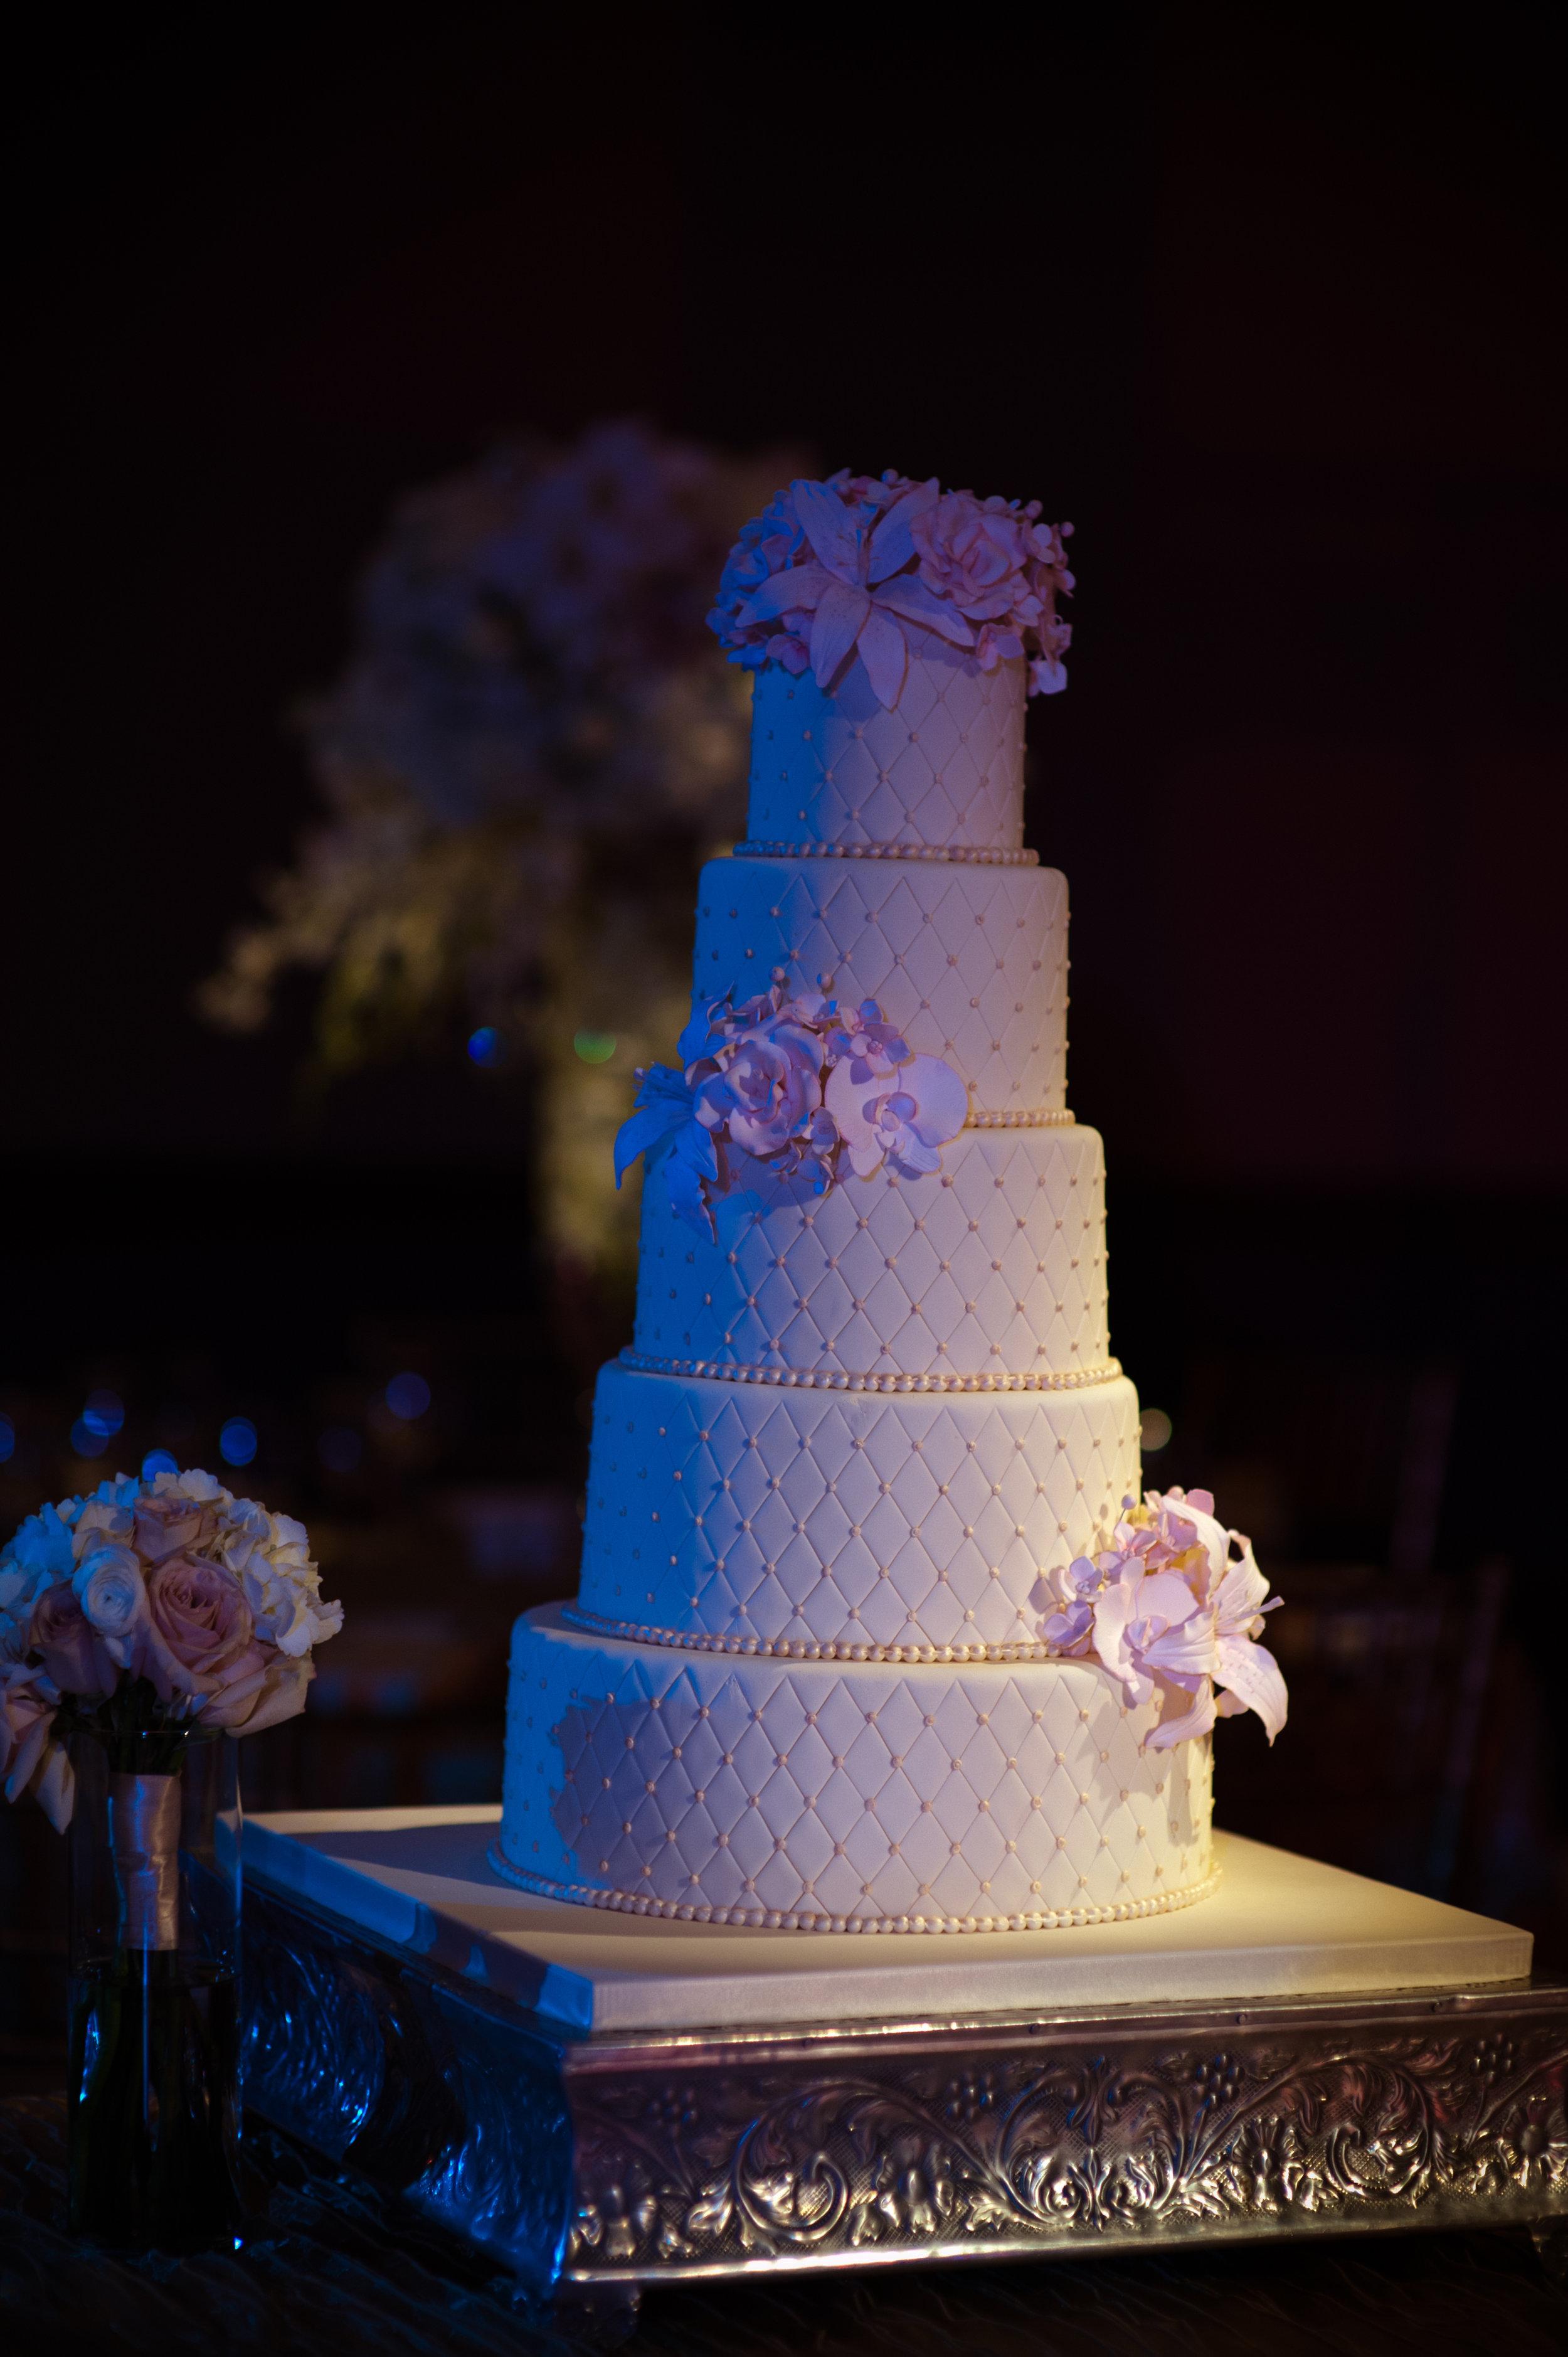 24 wedding cake 5 tier wedding cake all white wedding cake detailed wedding cake simple wedding cake flowers on wedding cake Christine Johnson Photography Life Design Events.jpg